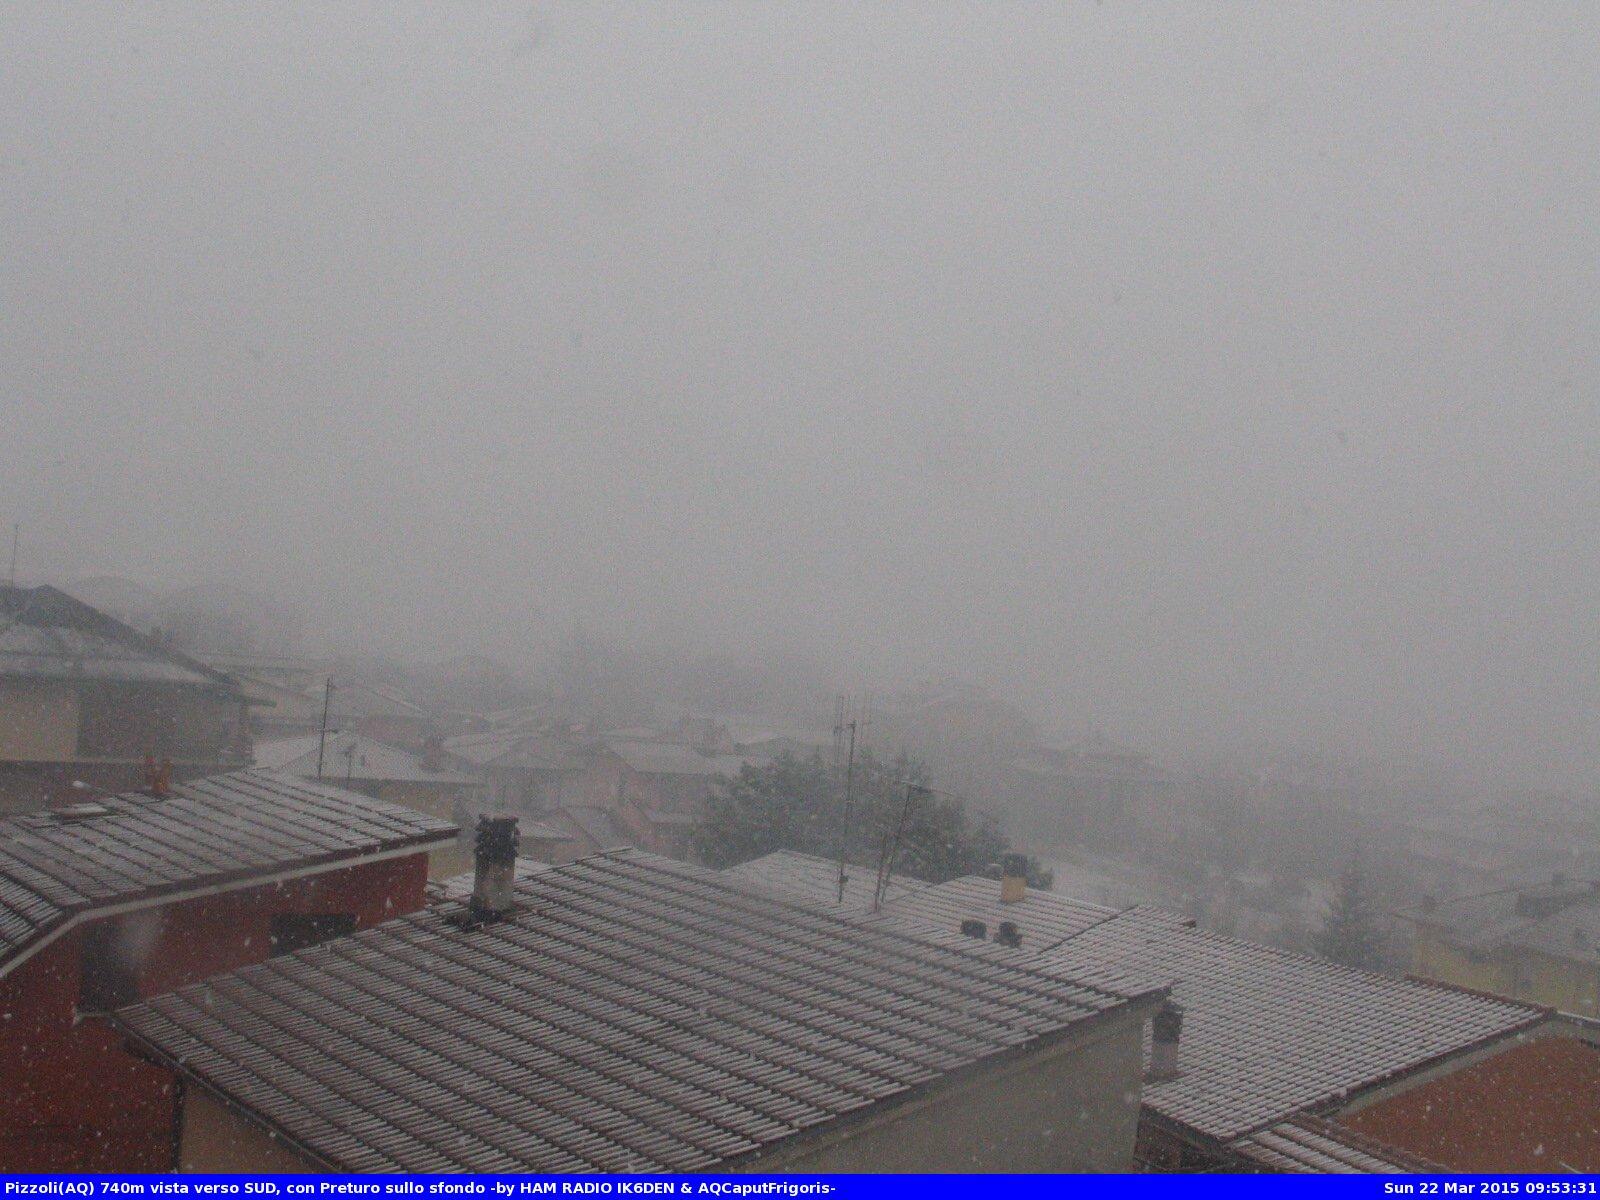 22 mar 15 pizzoli - Nevica sull'Appennino Centrale